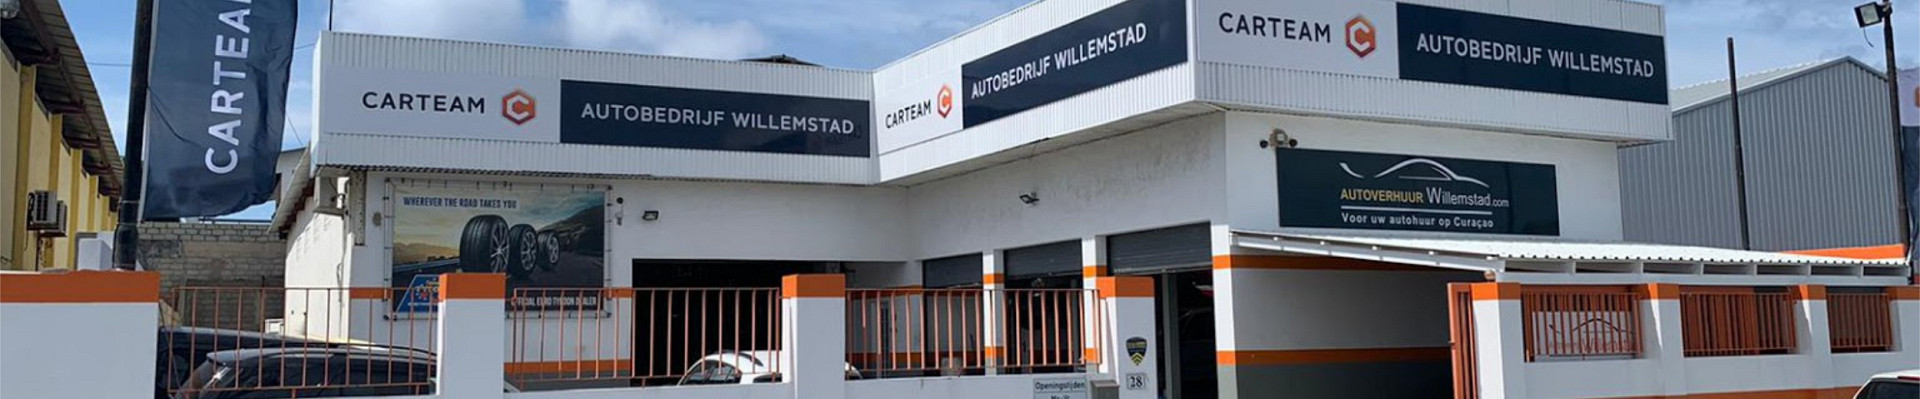 Carteam Autobedrijf Willemstad